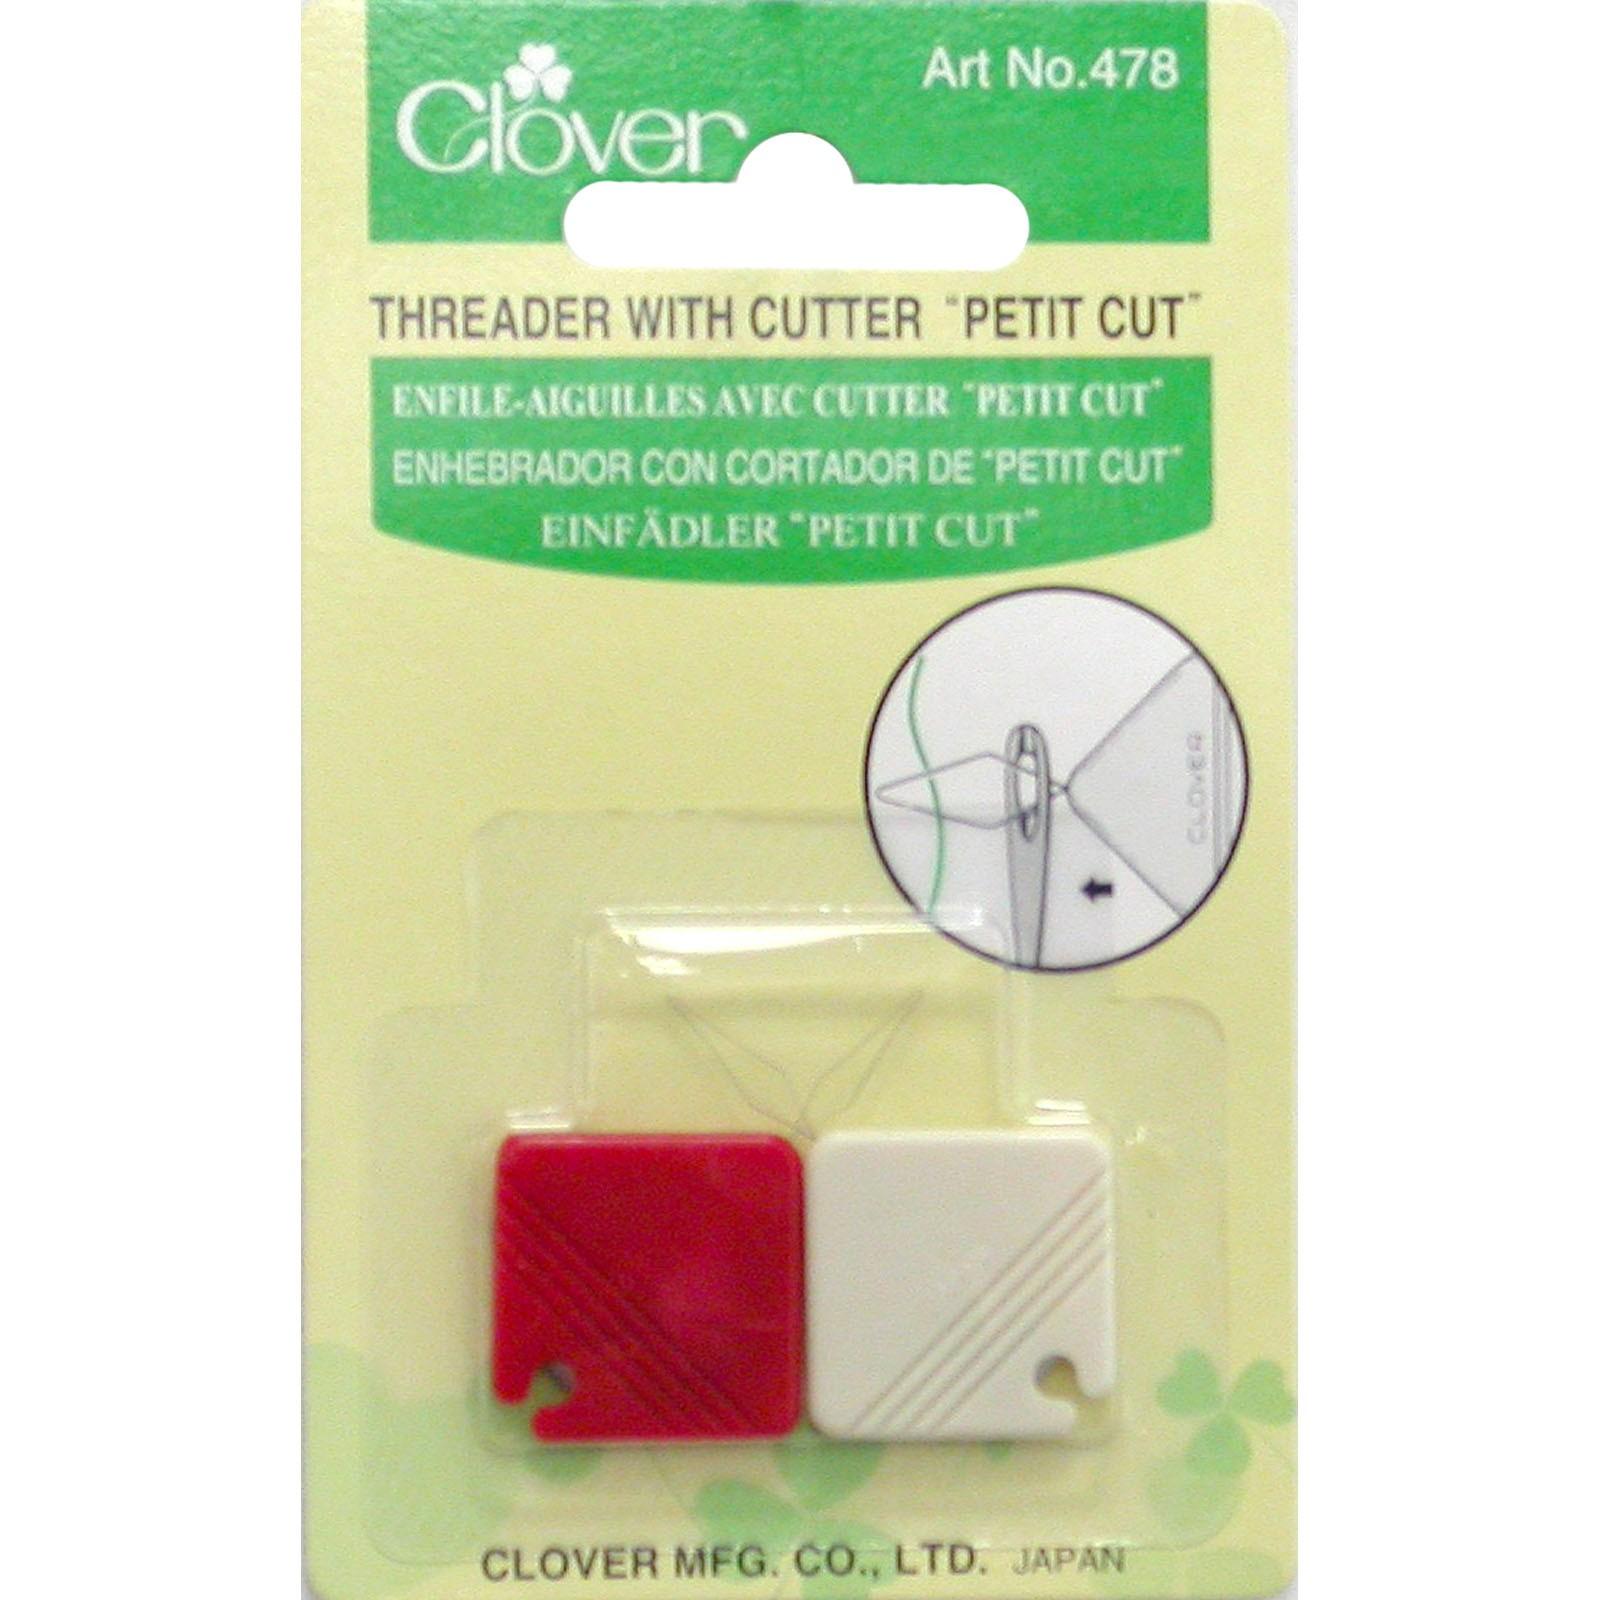 Clover Needle Threader w/ cutter